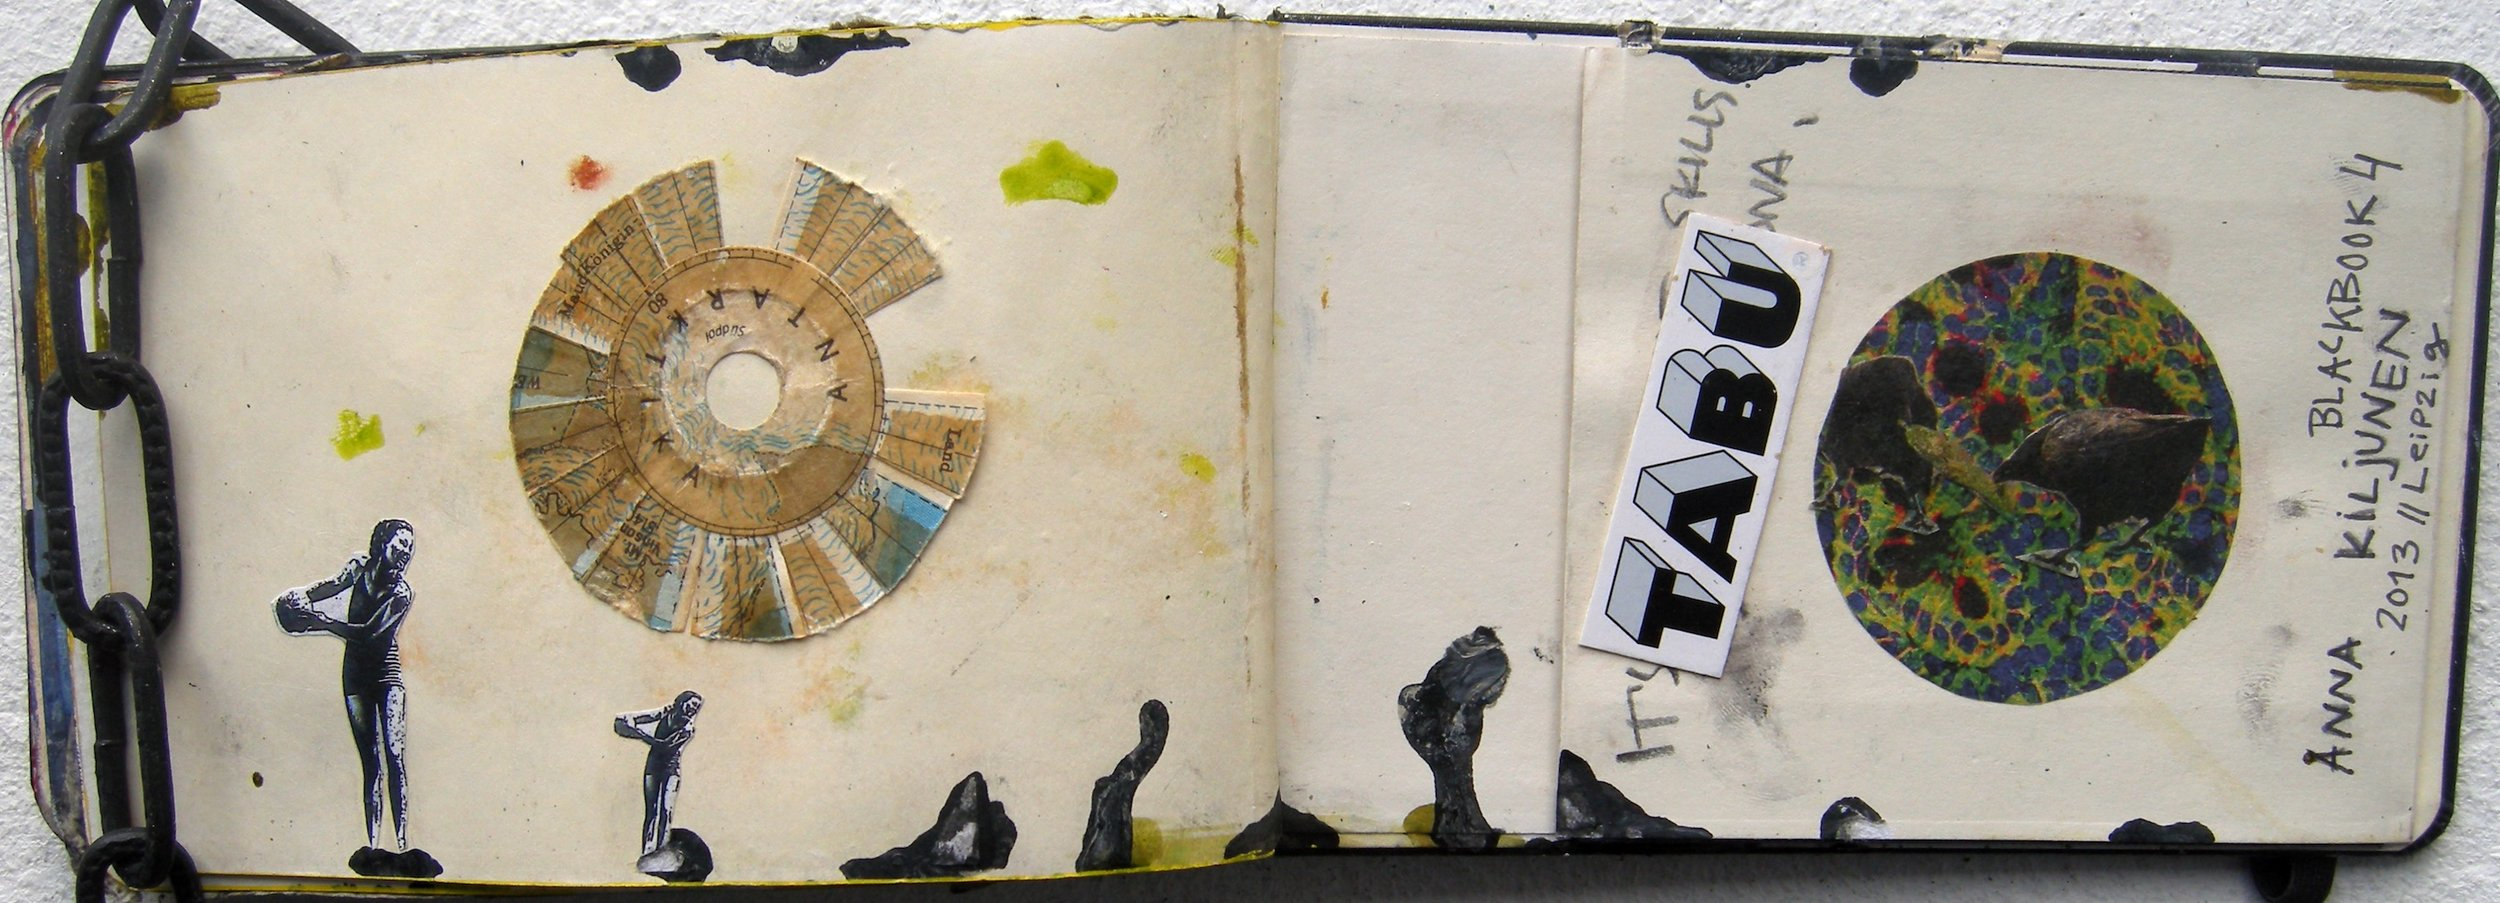 blackbook4.28.jpg